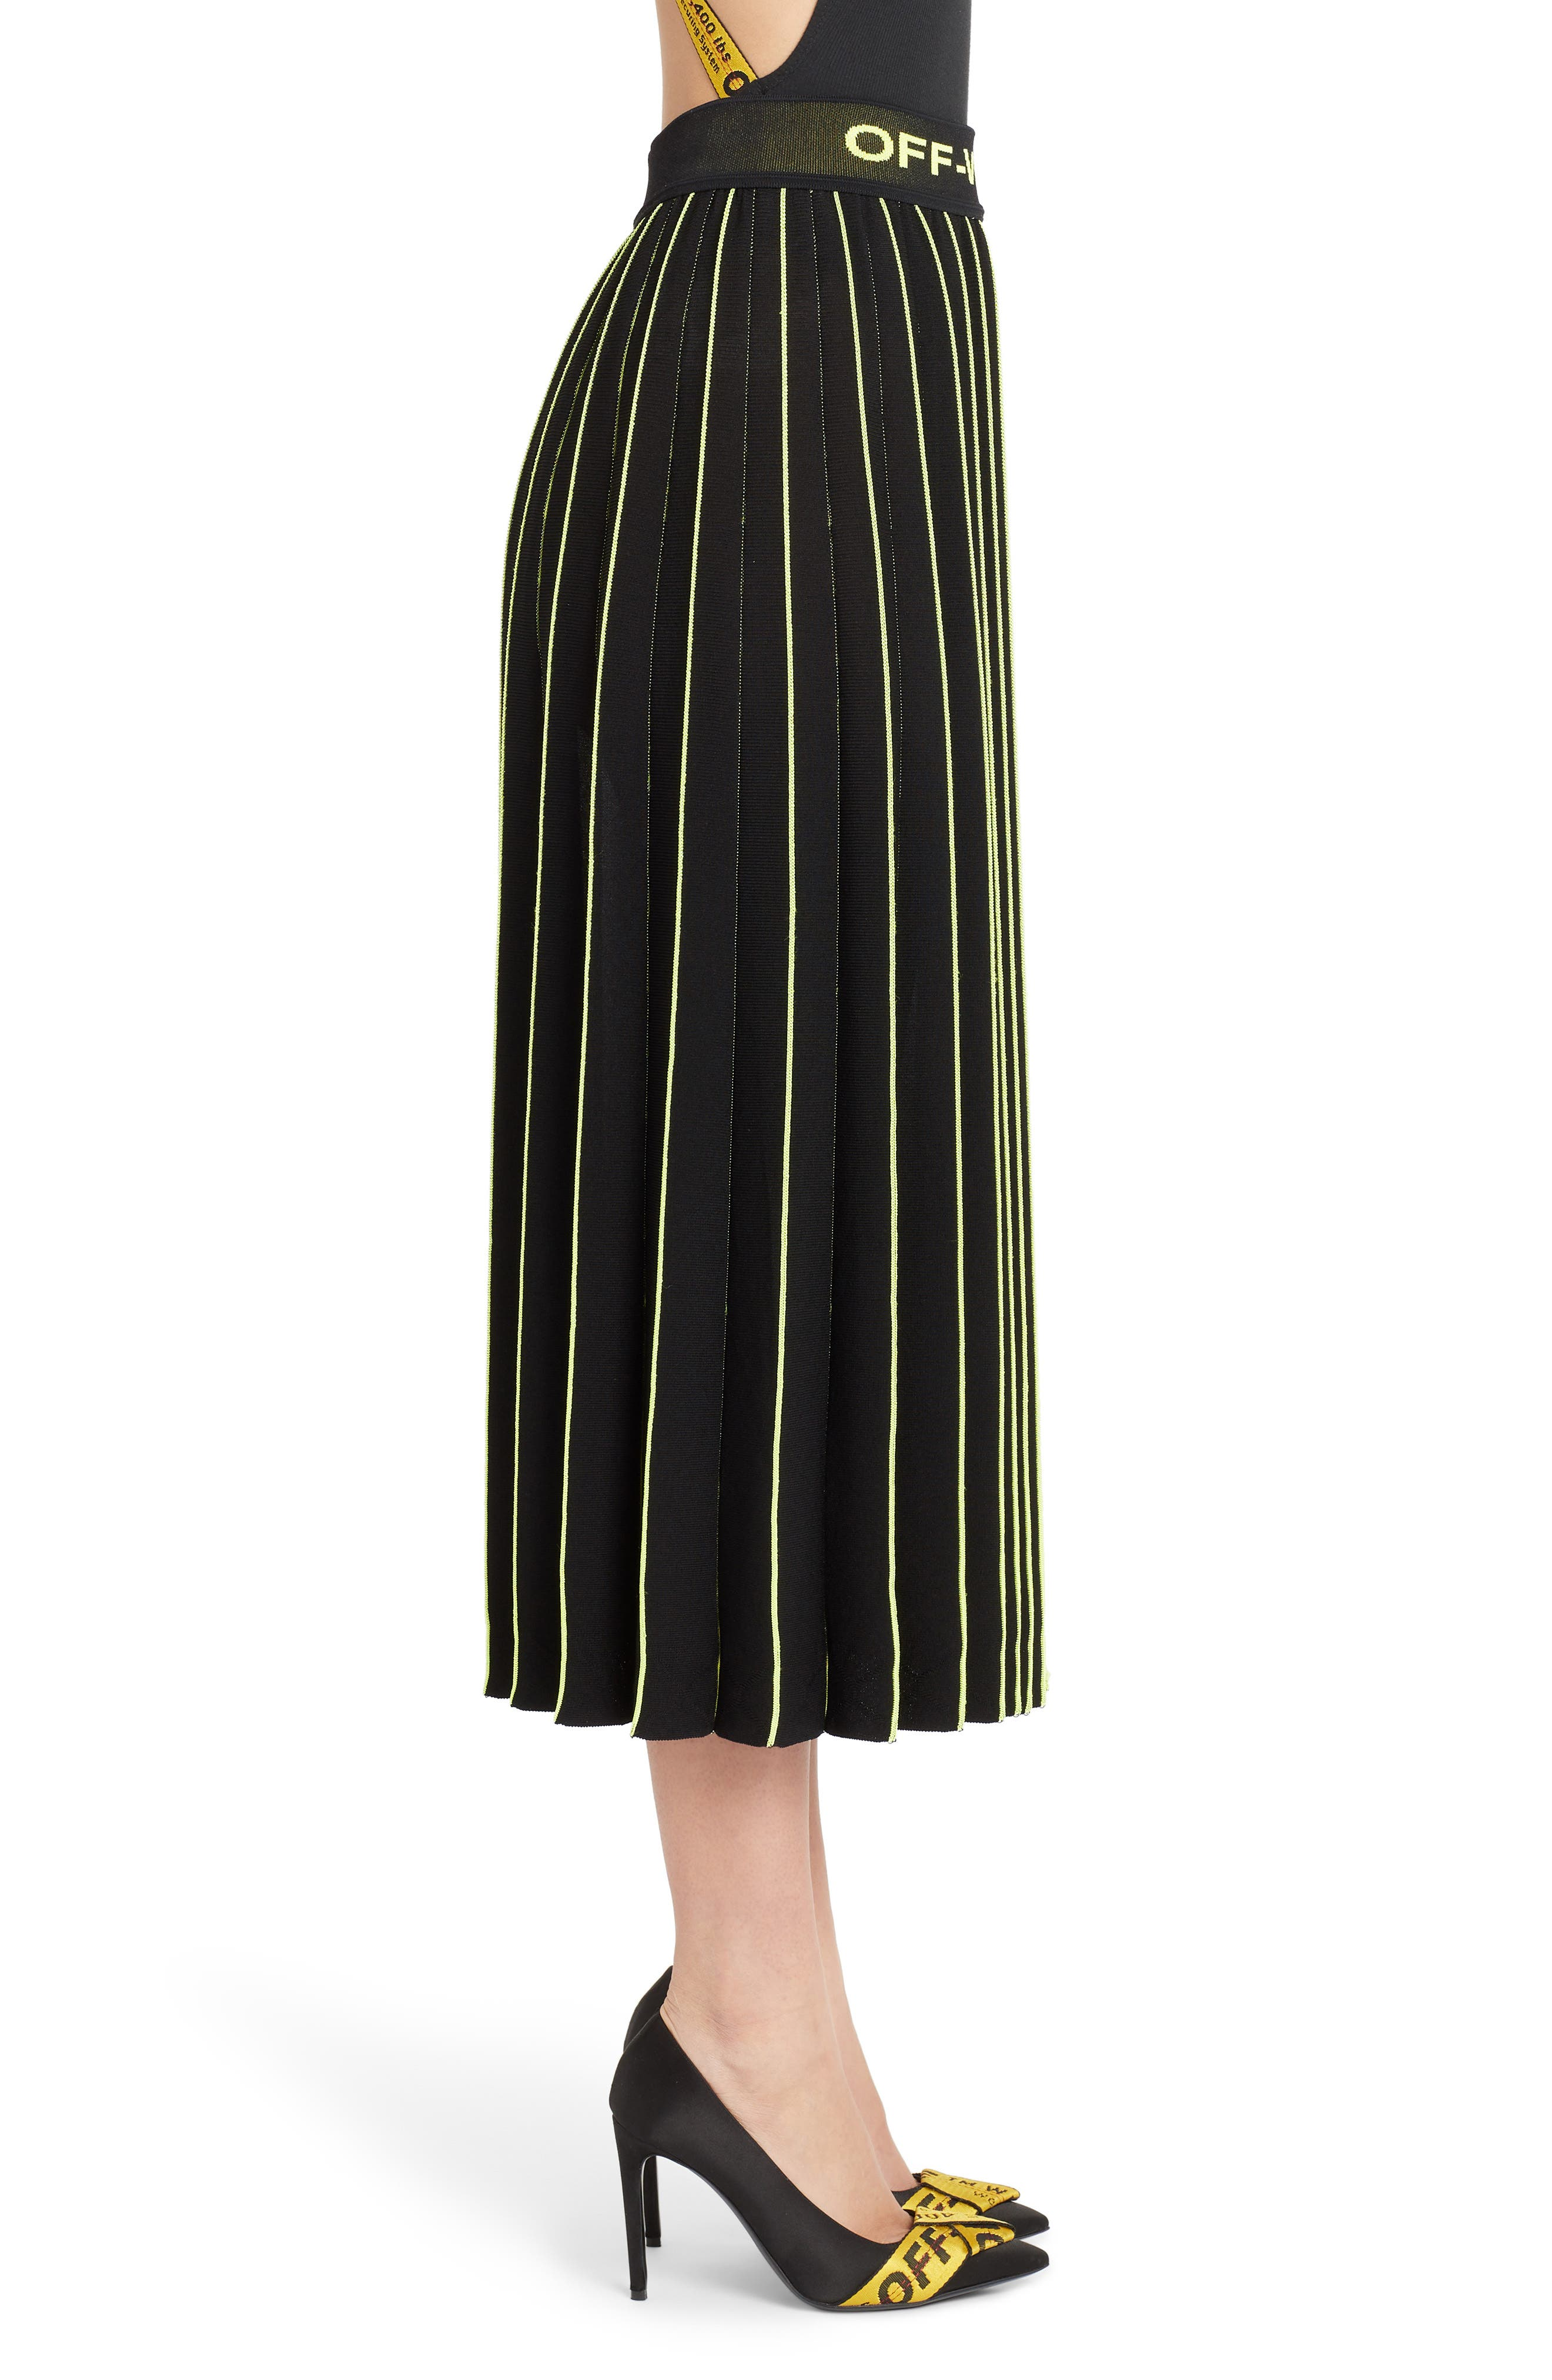 OFF-WHITE, Plissé Sweater Skirt, Alternate thumbnail 3, color, BLACK